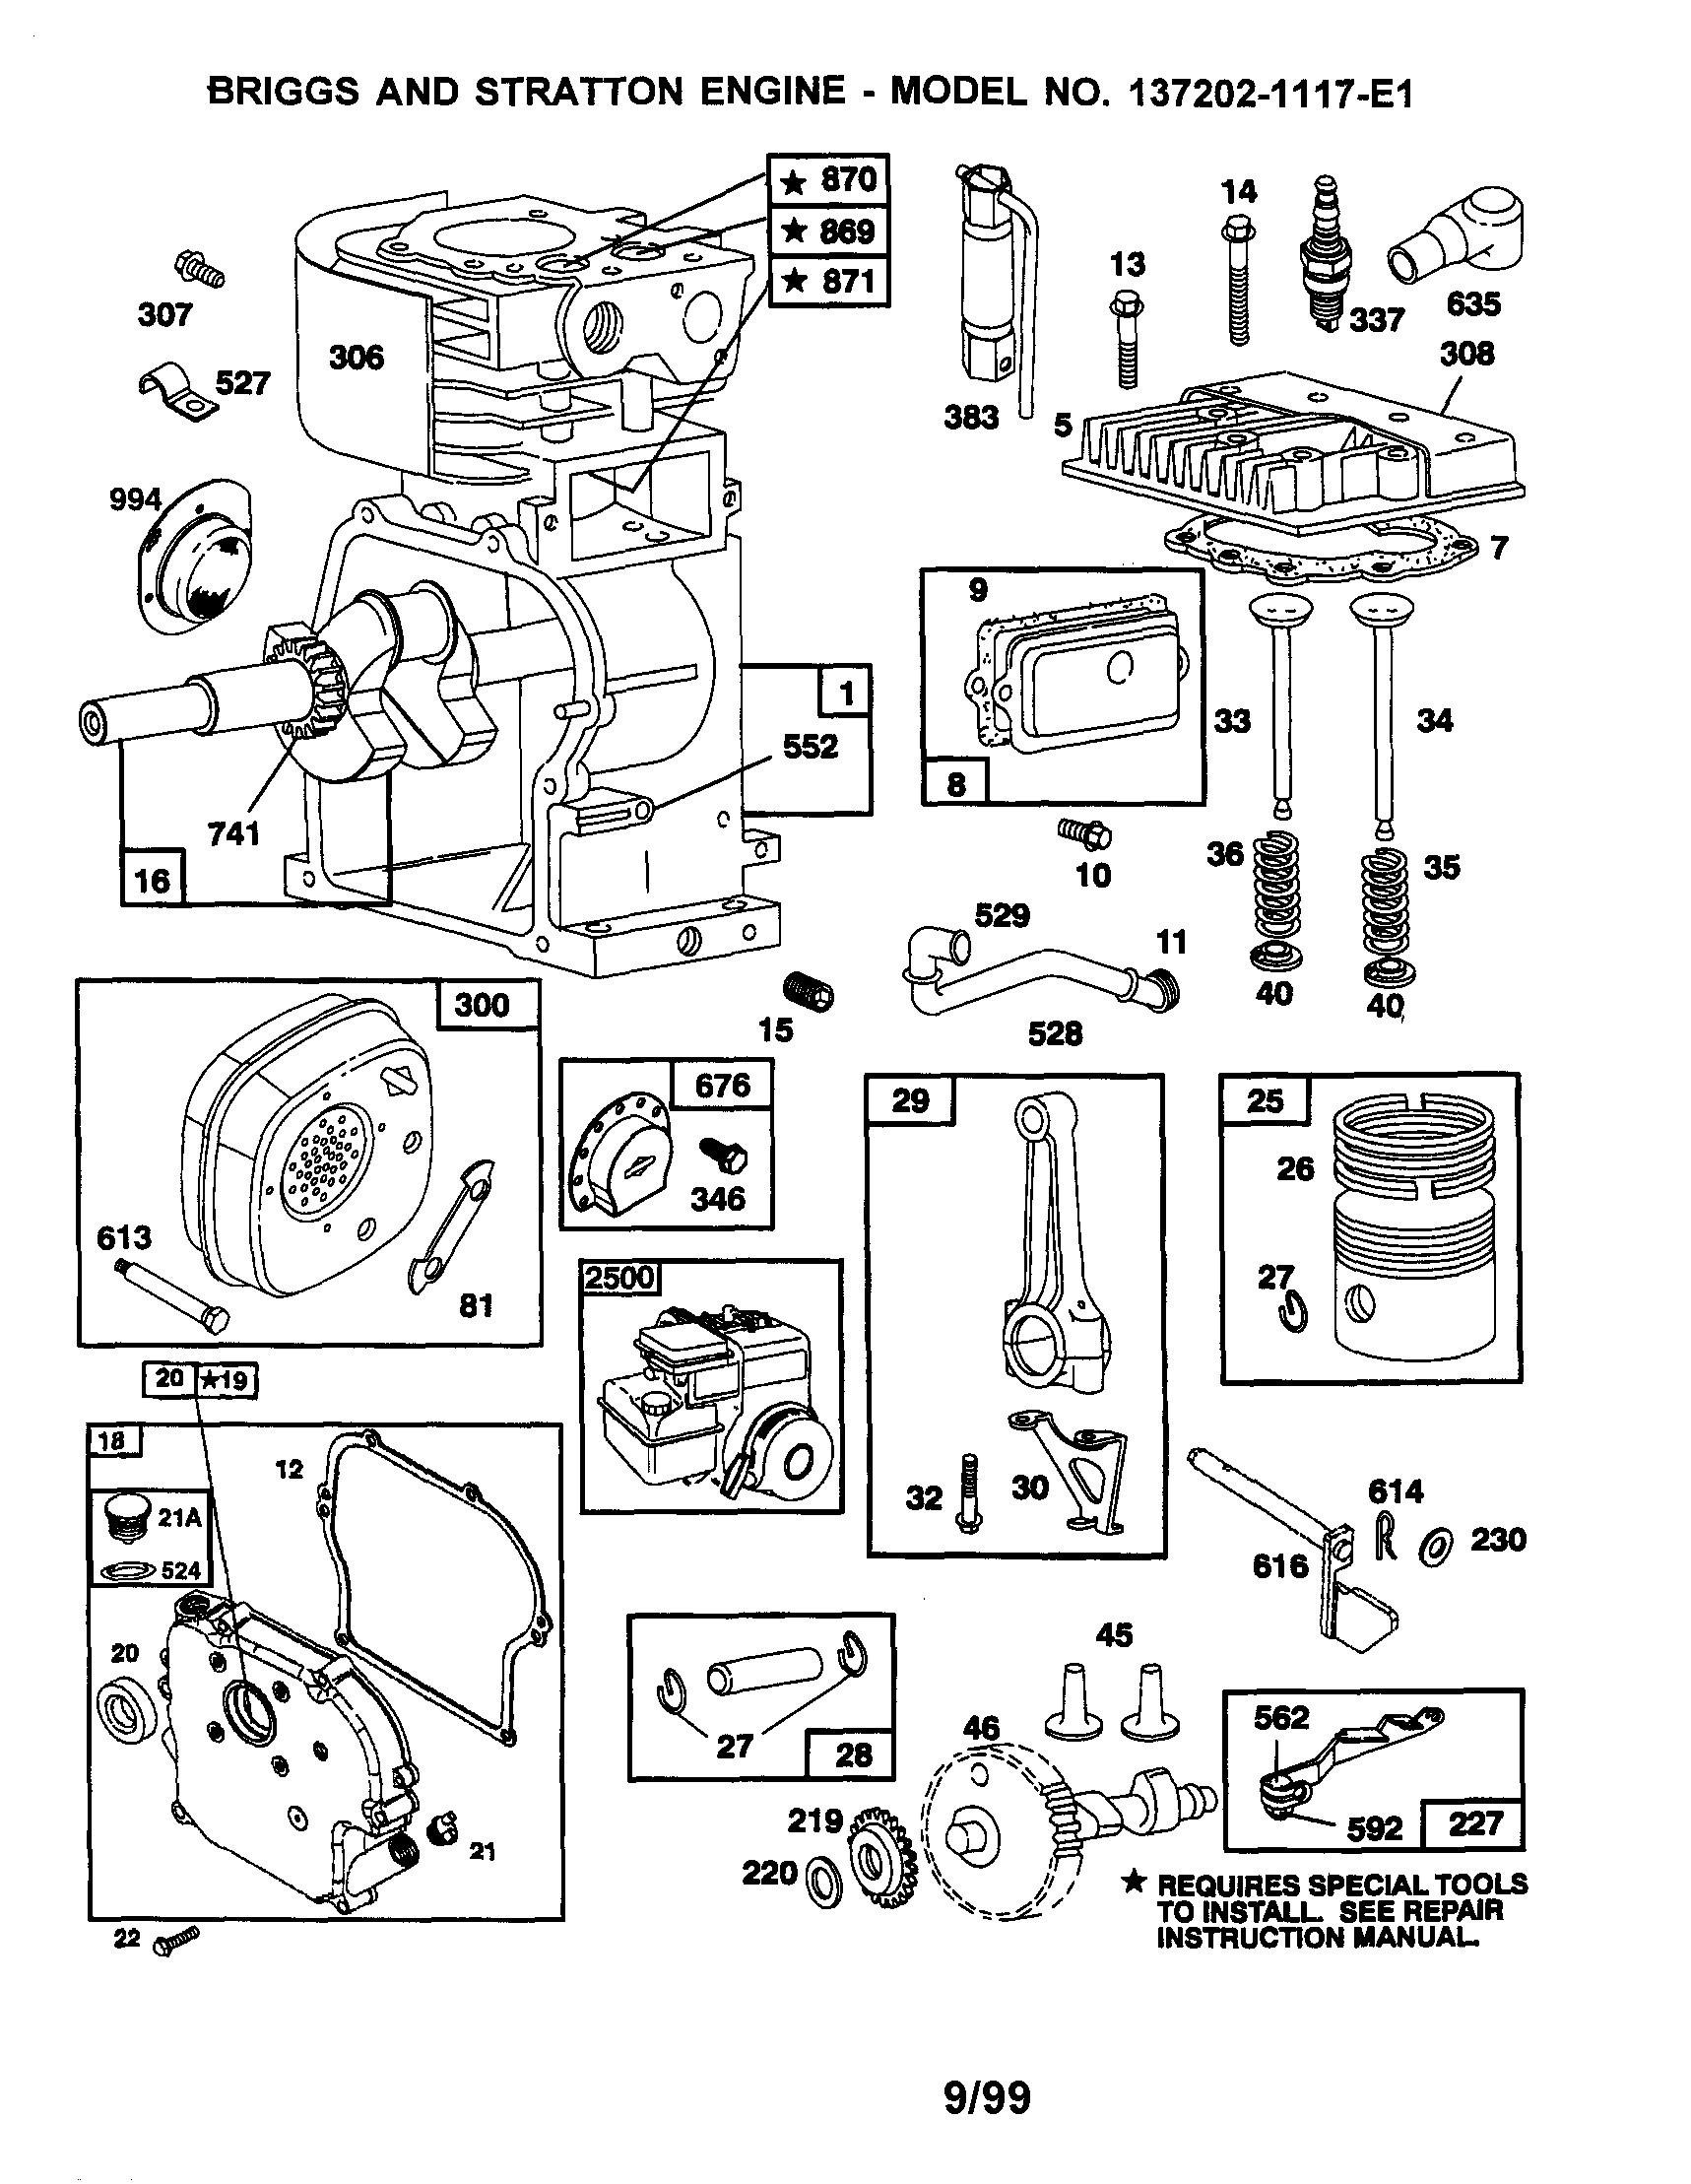 Briggs And Stratton 5hp Engine Diagram